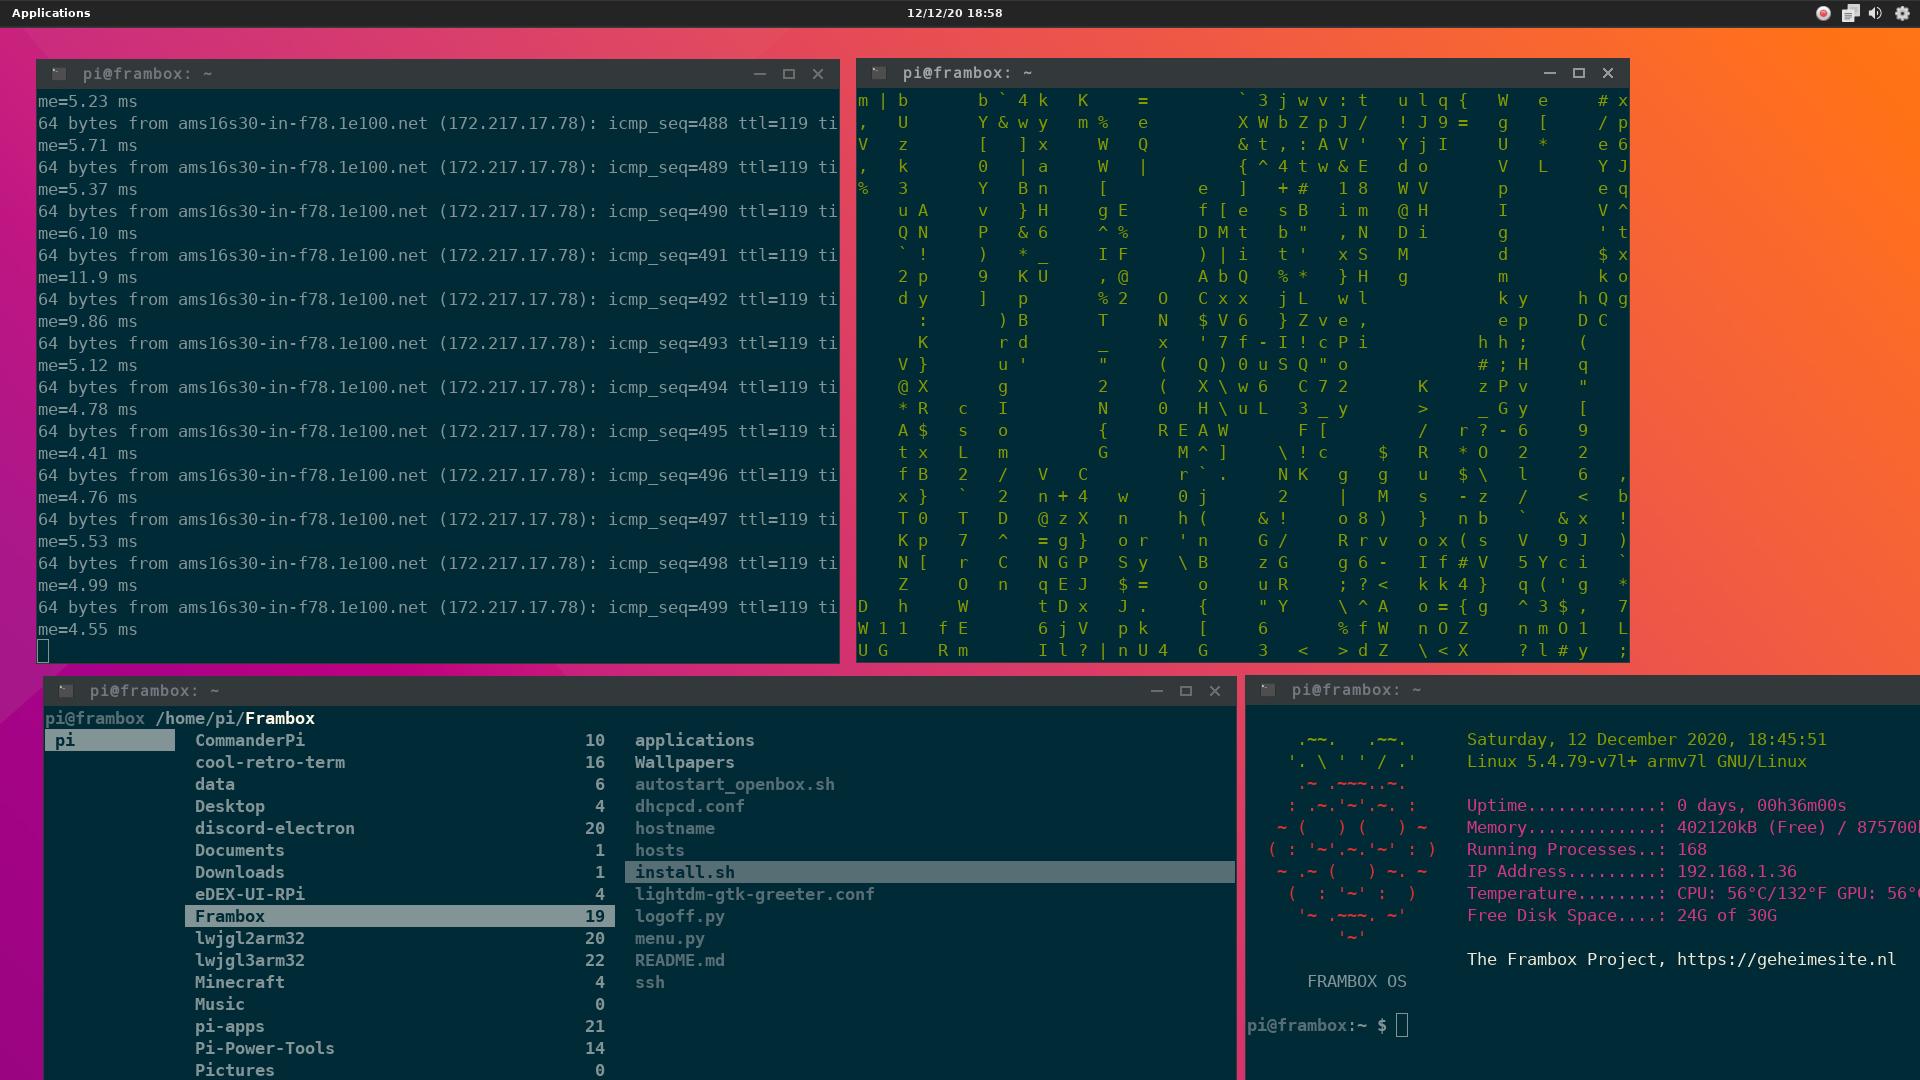 FramboxDesktop Screenshot